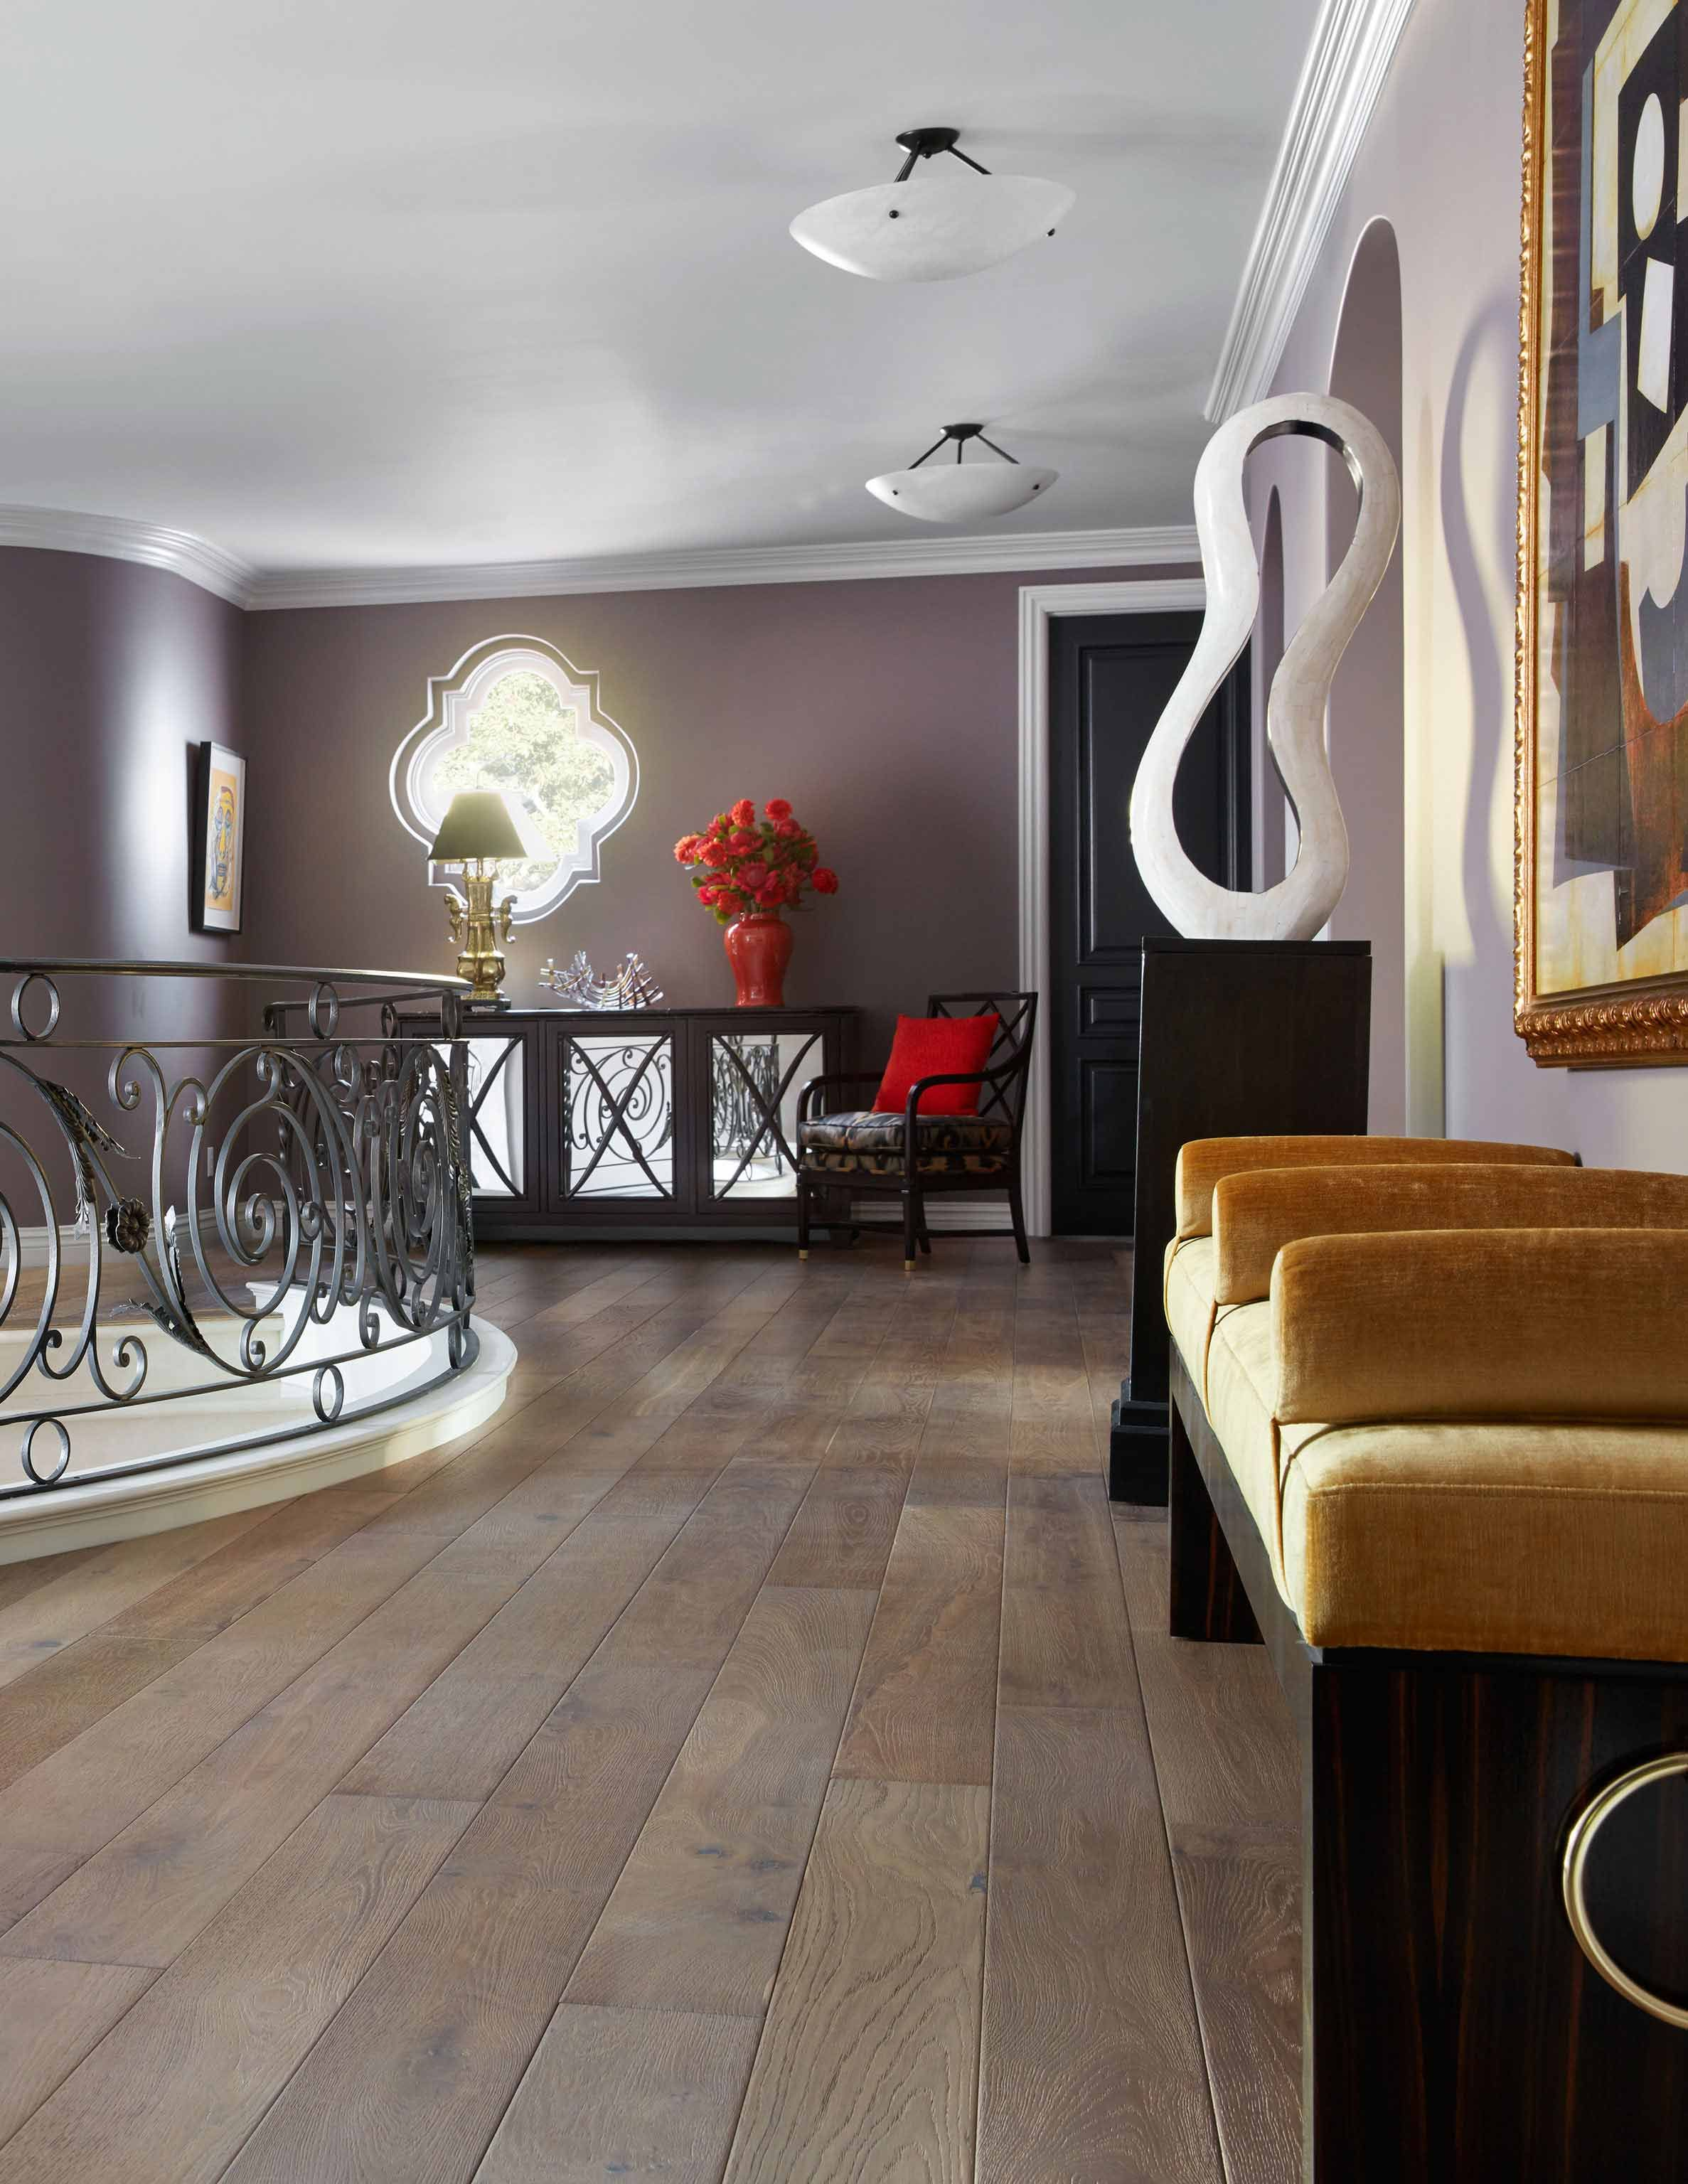 Smoked Sliced French Oak Matisse Villette Smoked Sliced French Oak Wood Floors Wide Plank French Oak Flooring House Flooring